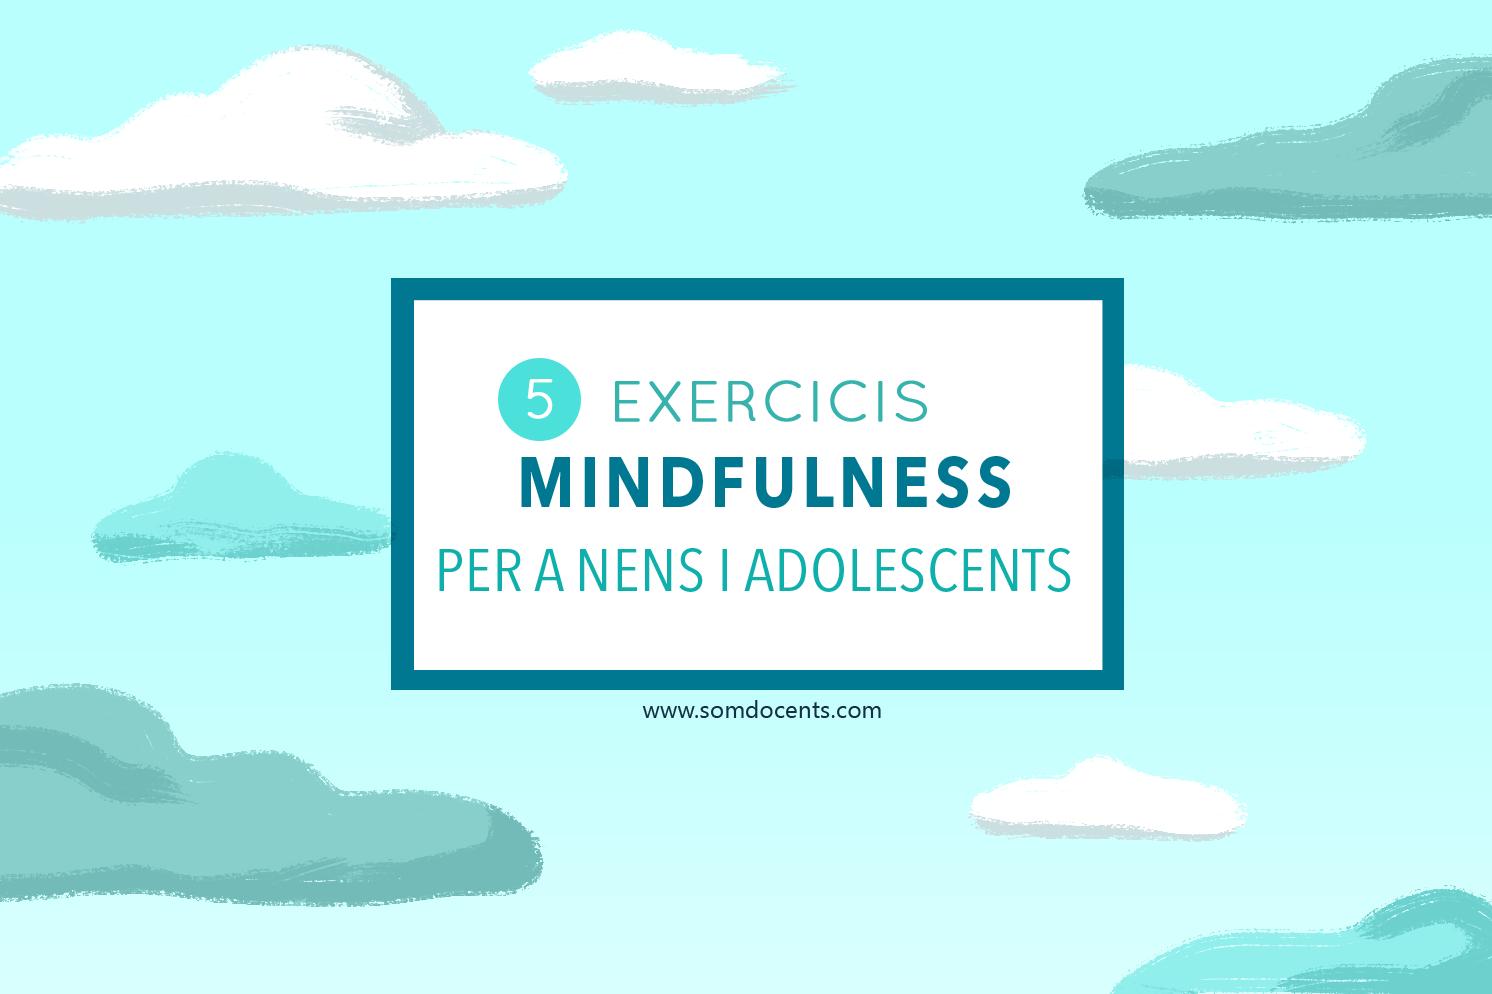 Somdocents-mindfulness